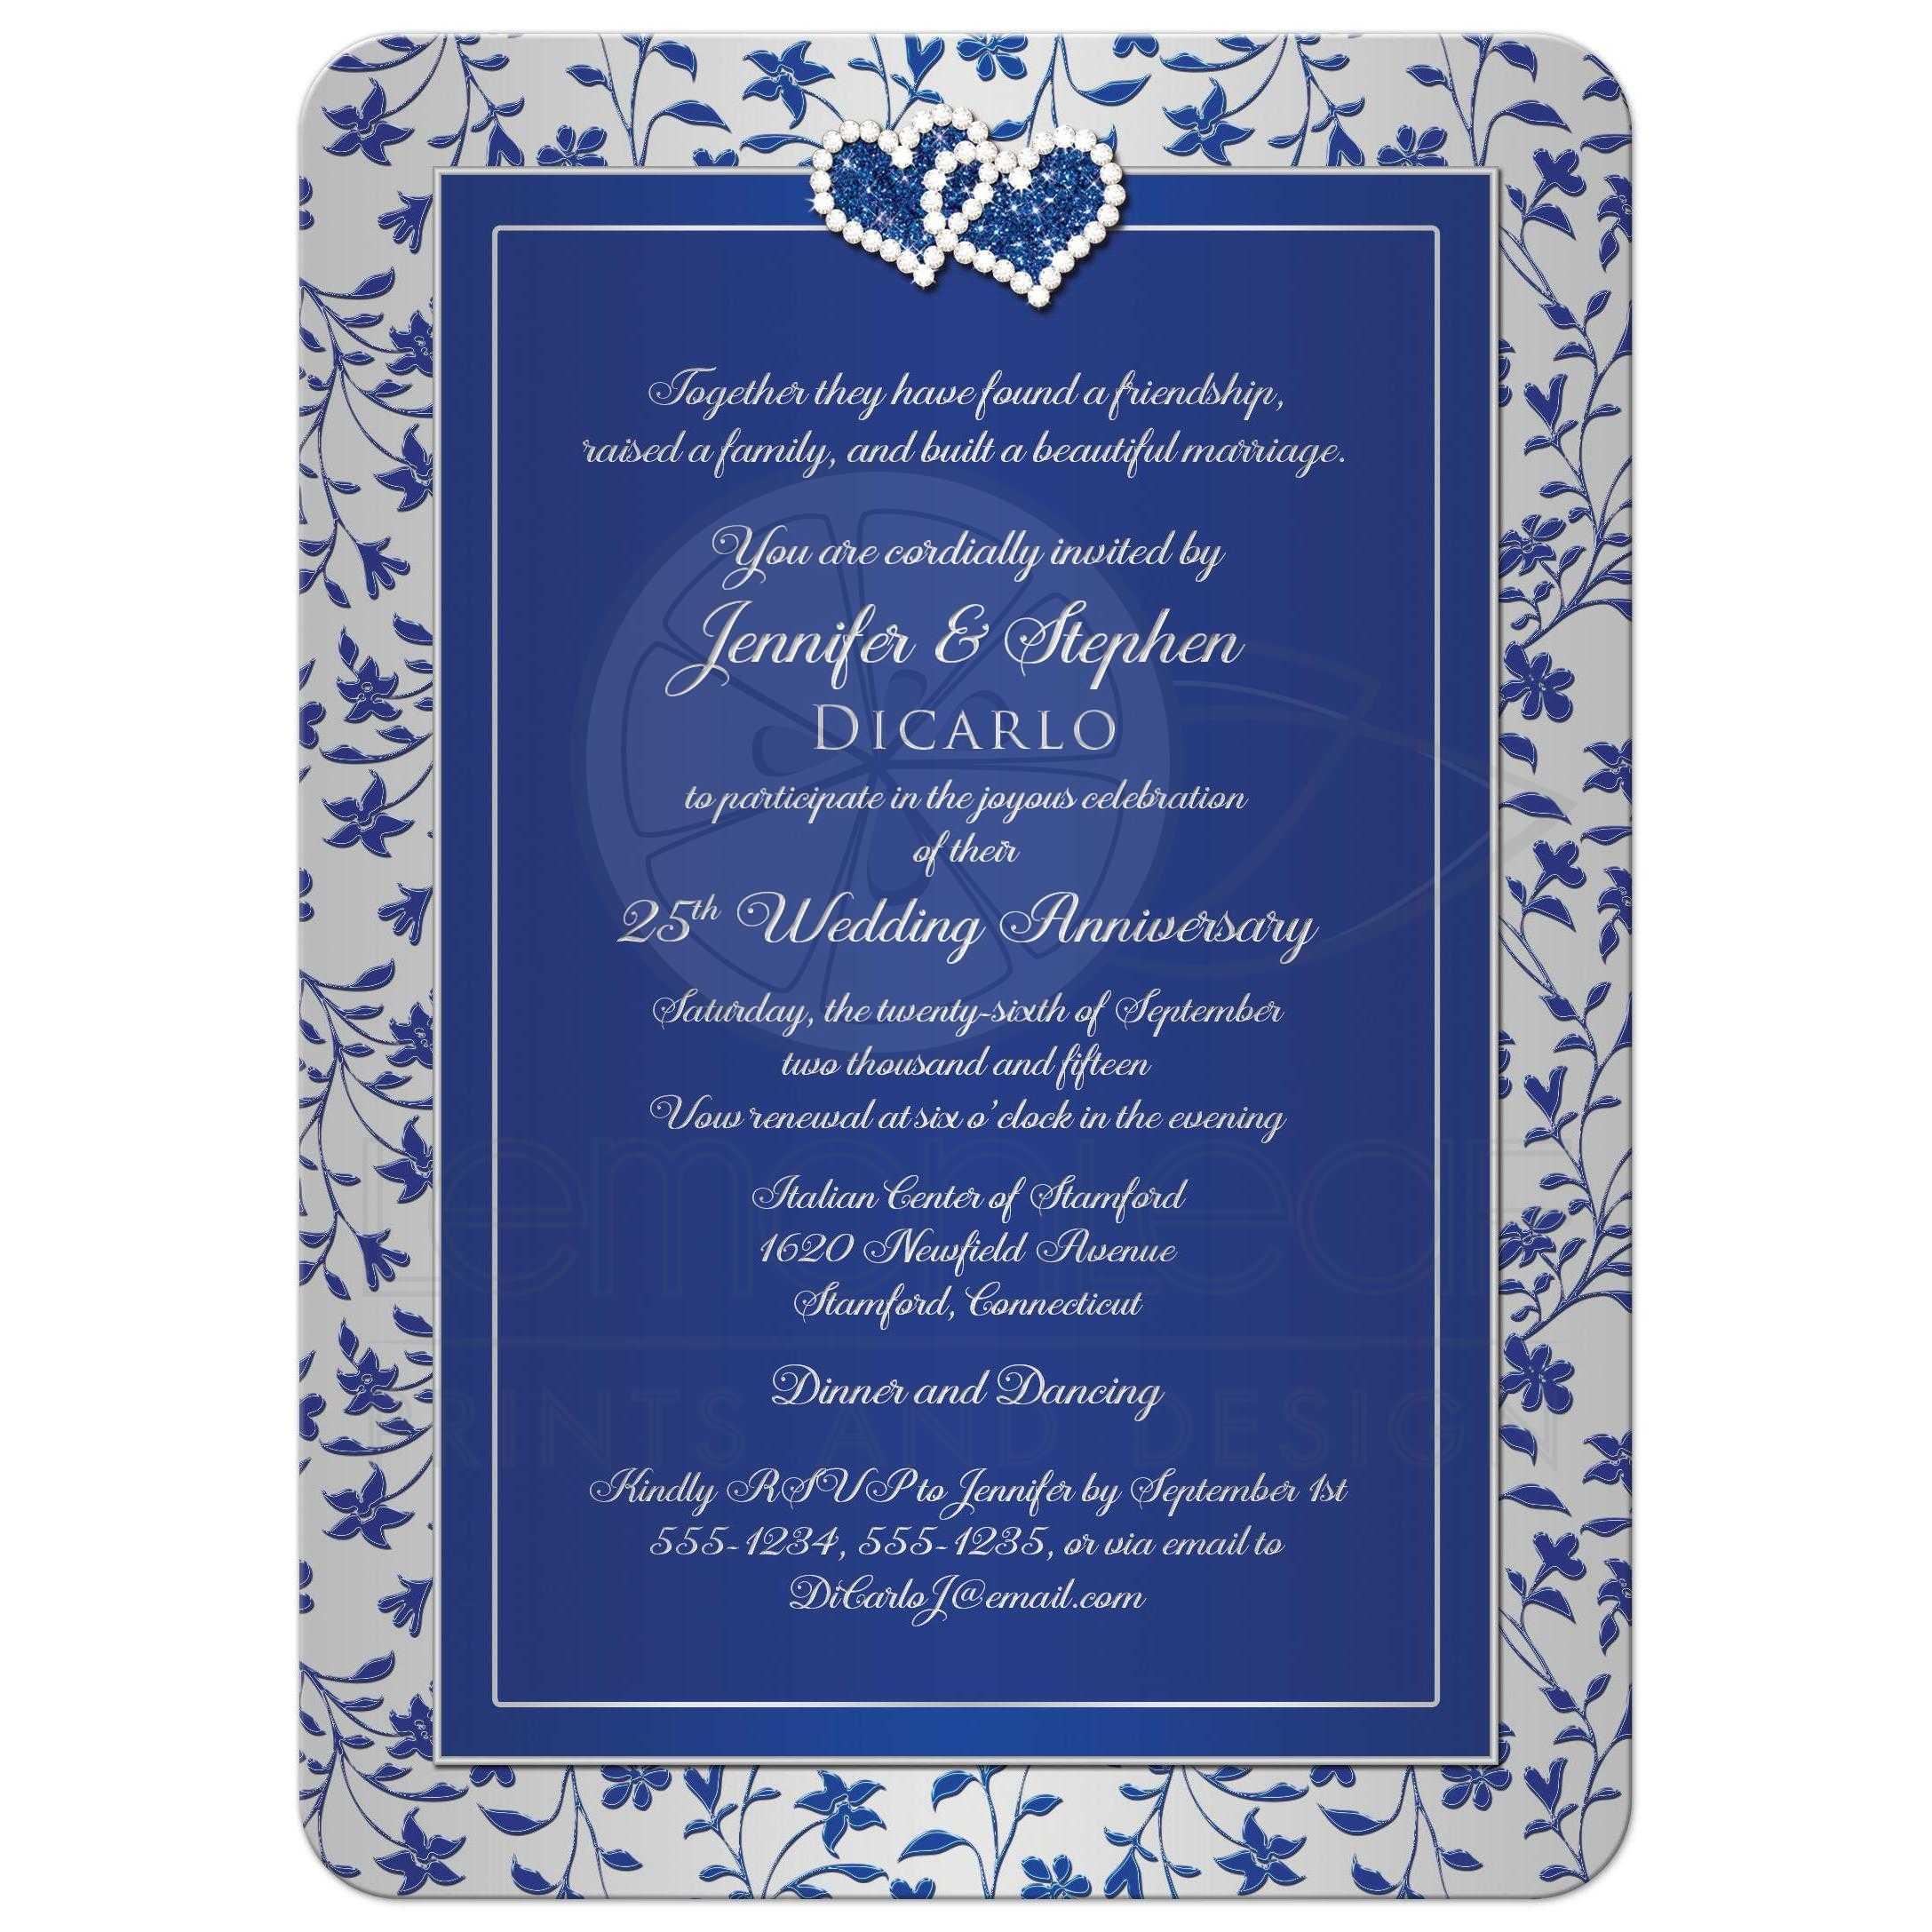 25th Wedding Anniversary Invitation 2 Royal Blue Silver